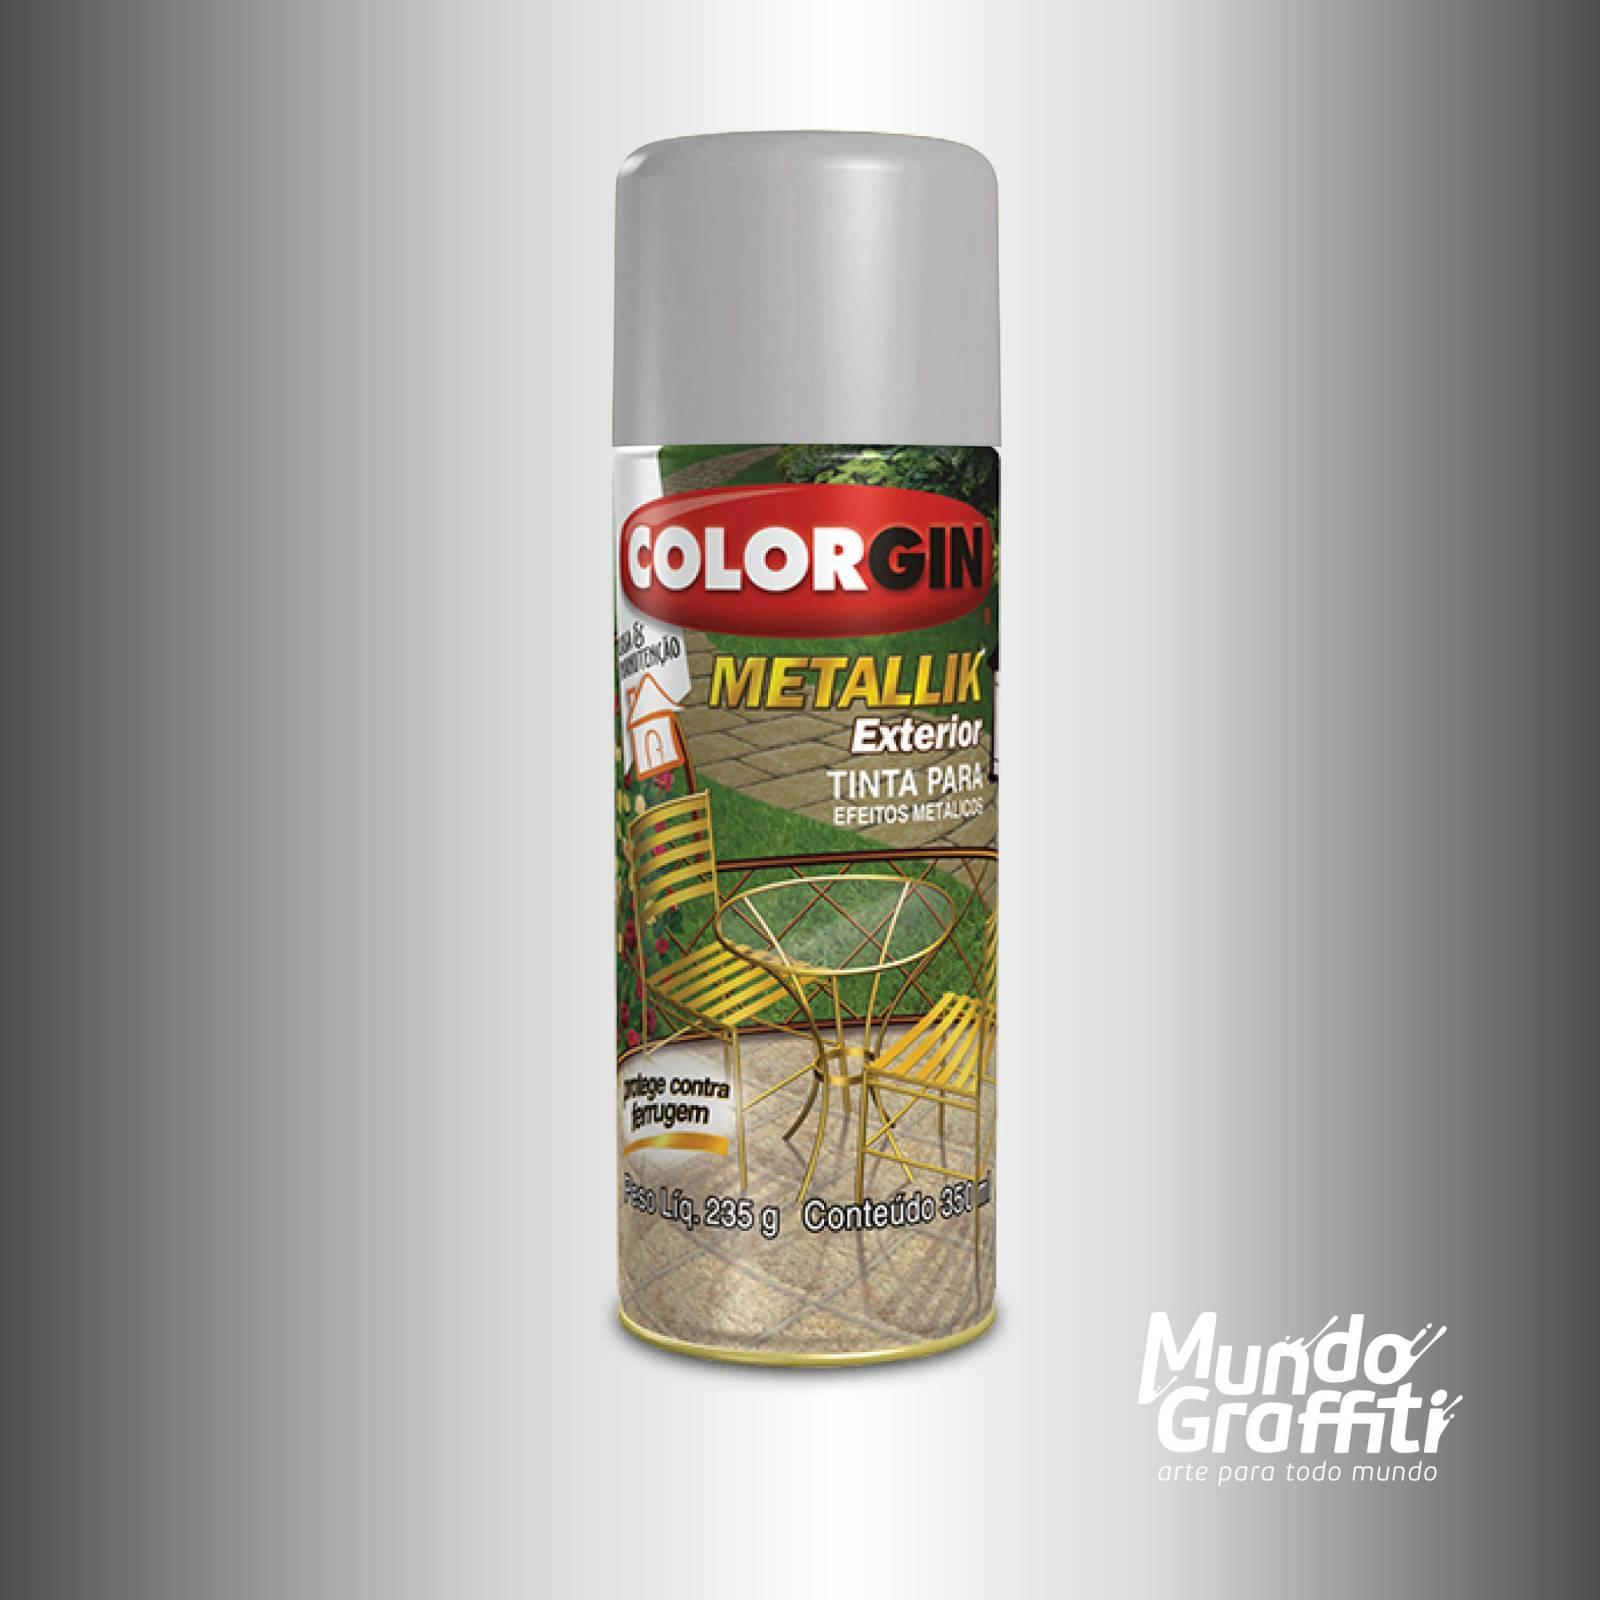 Tinta Spray Colorgin Metallik Exterior 64 Prata 350ml - Mundo Graffiti